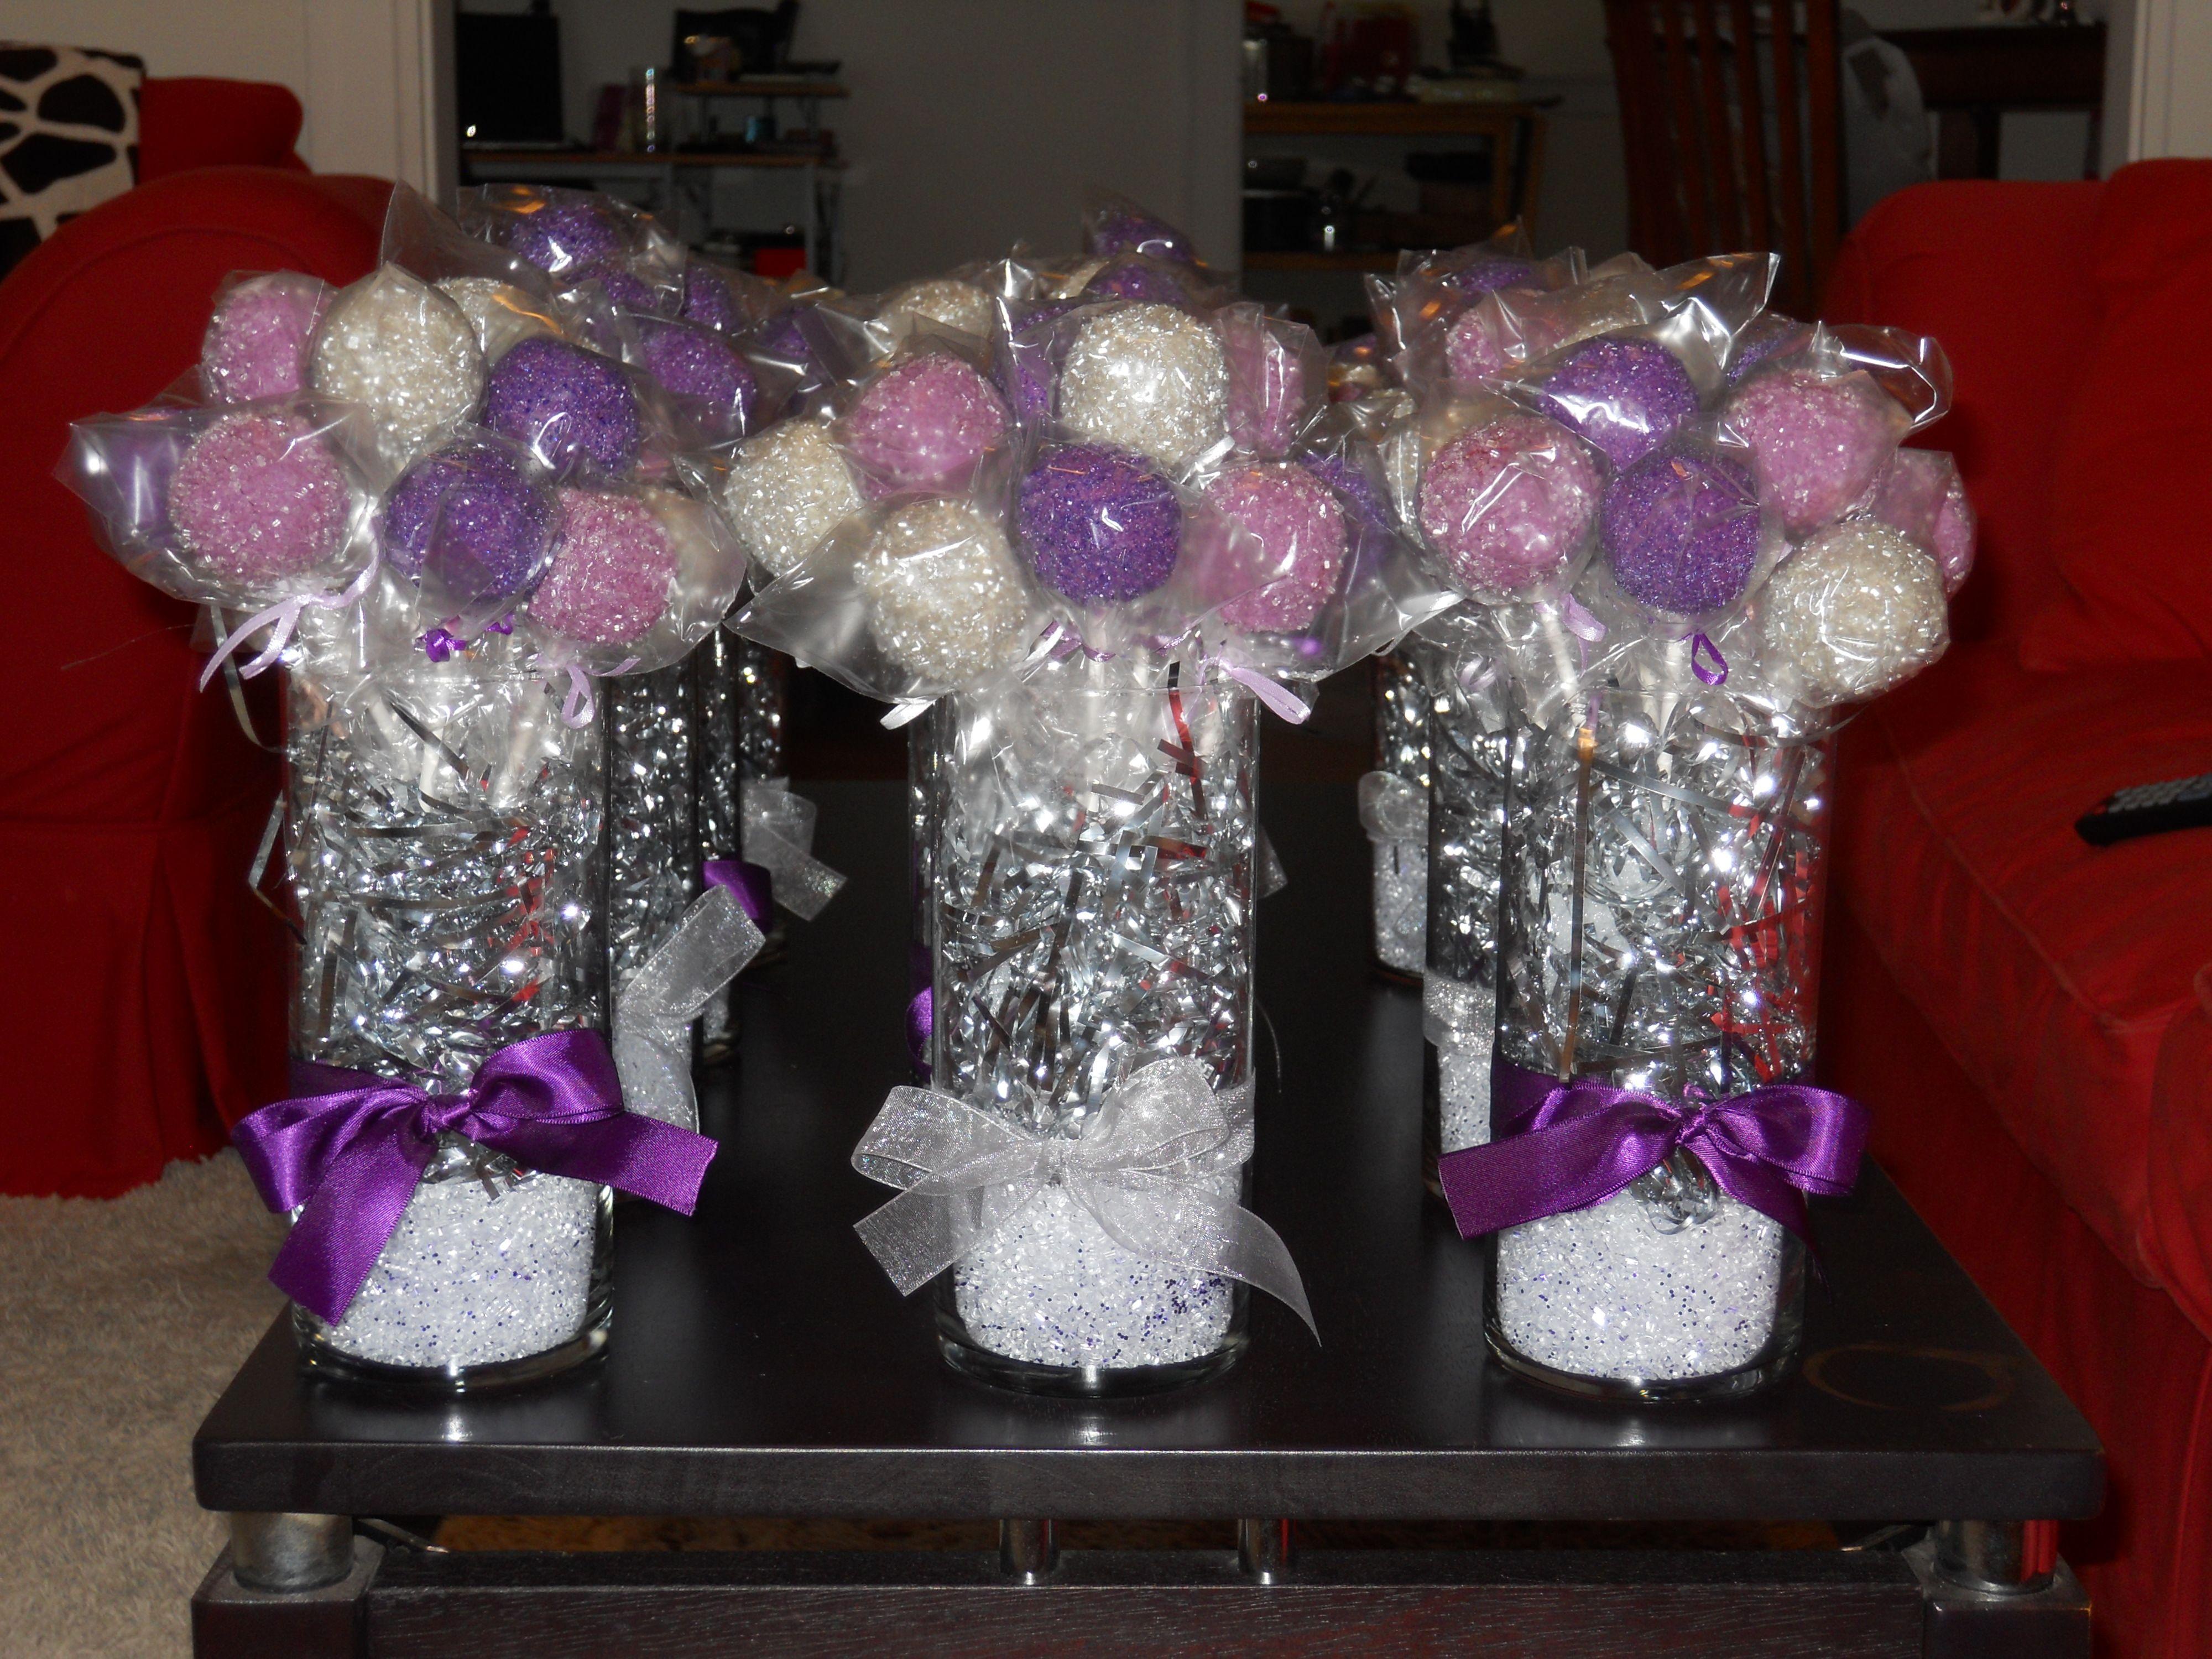 cake pop ideas wedding shower%0A Road Map Of Minnesota Usa